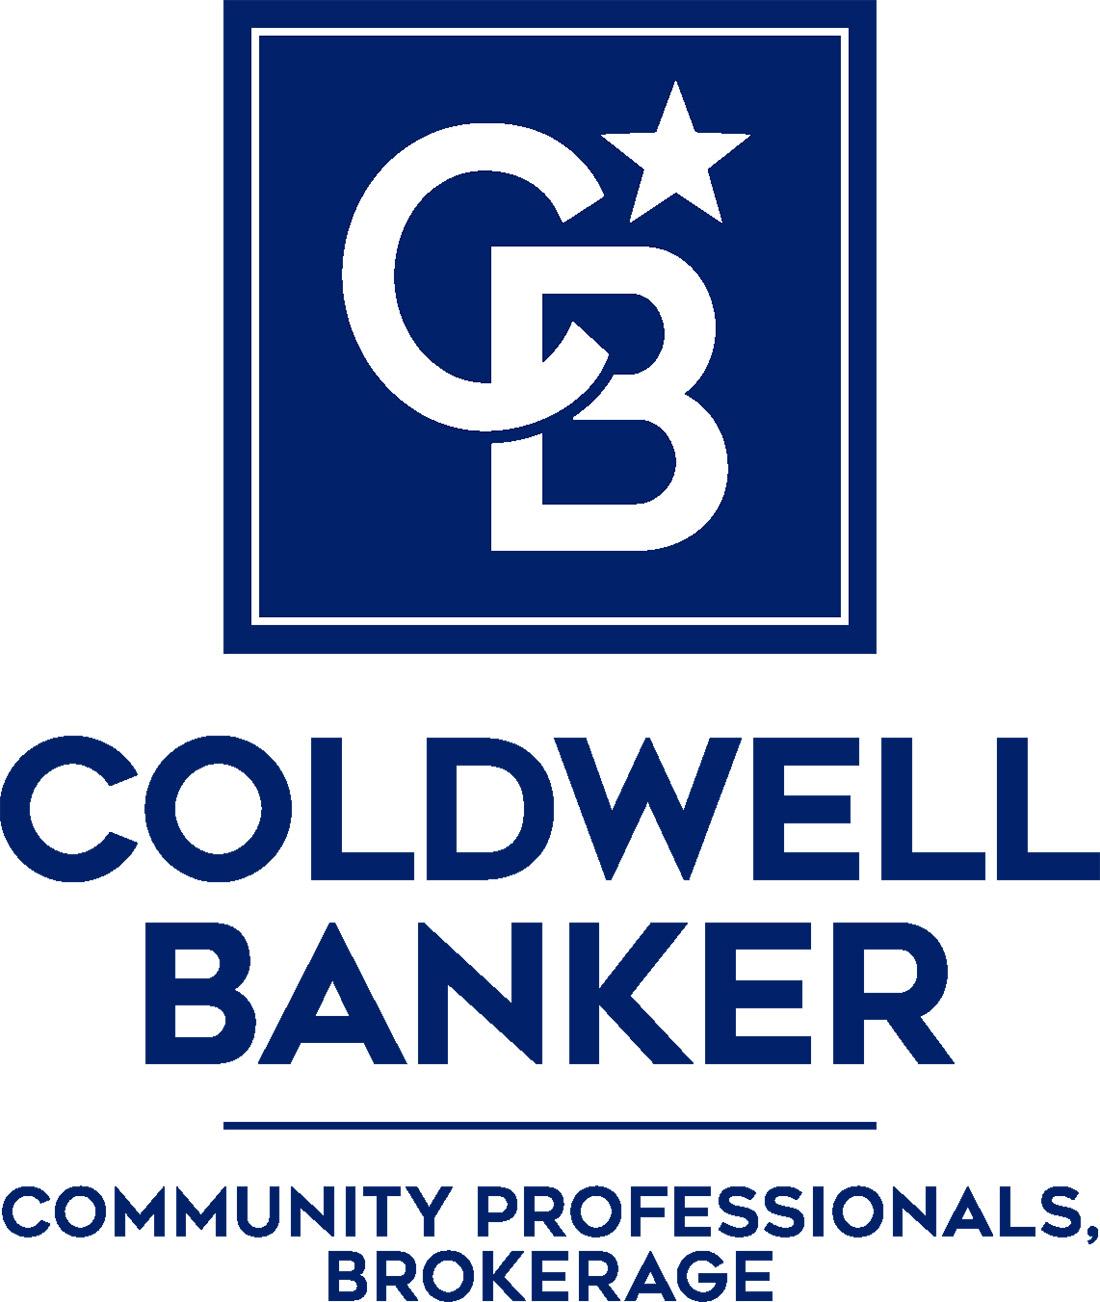 Ashlee McLean - Coldwell Banker Community Professionals Logo